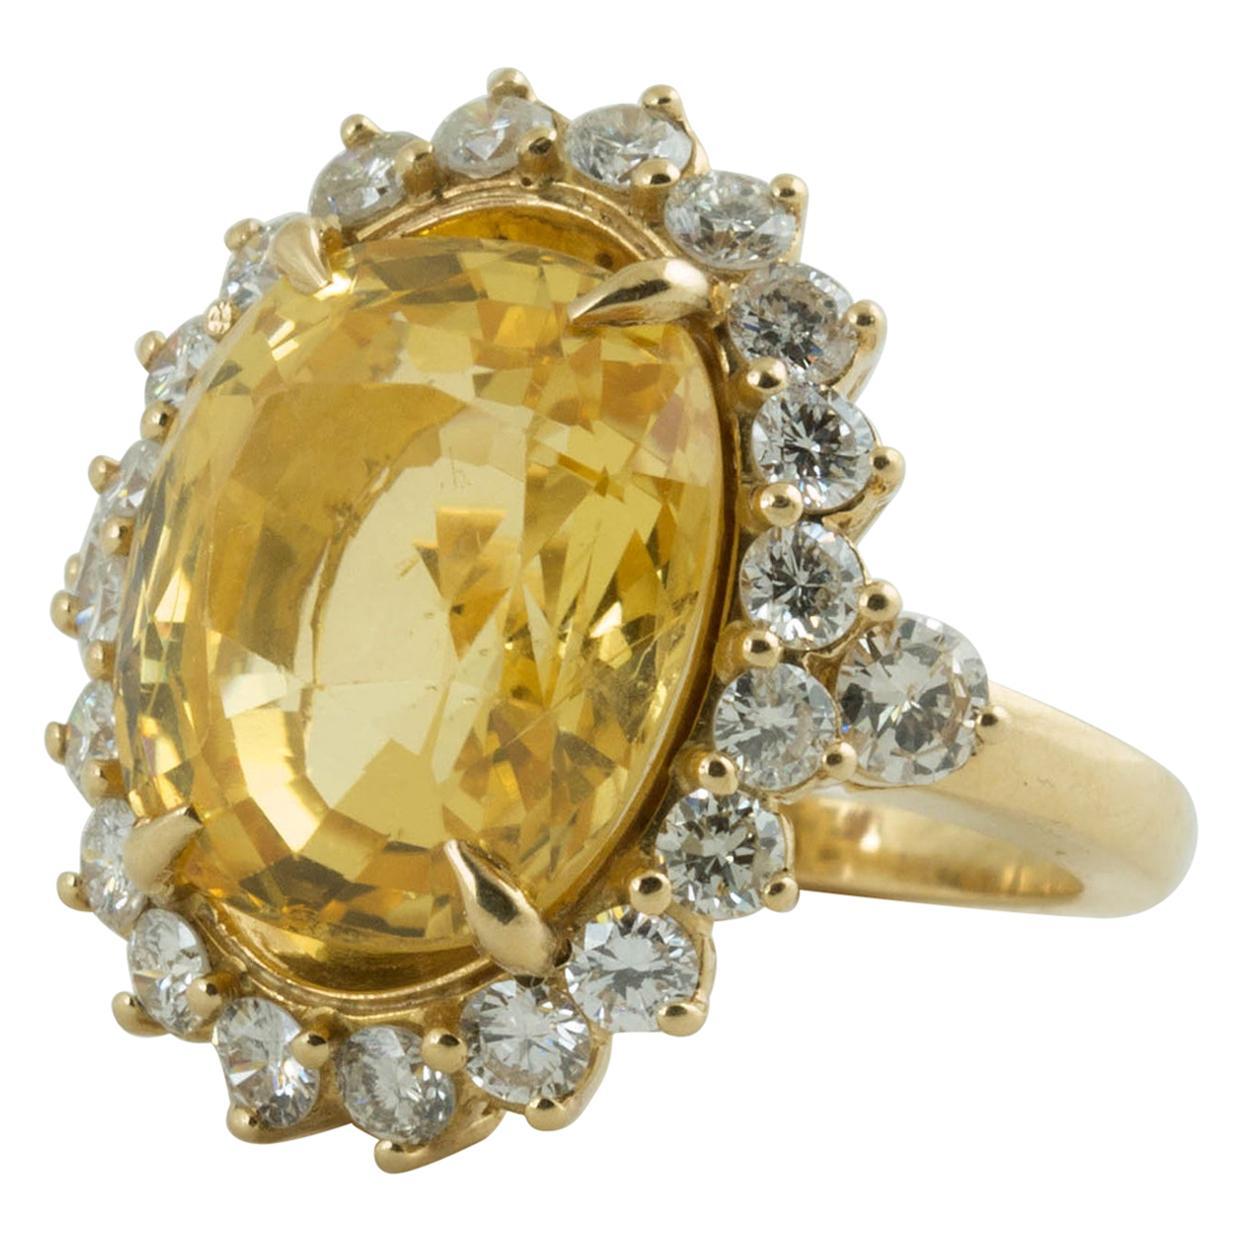 SSEF Certified Natural No Heat Yellow Sapphire Diamond Ring